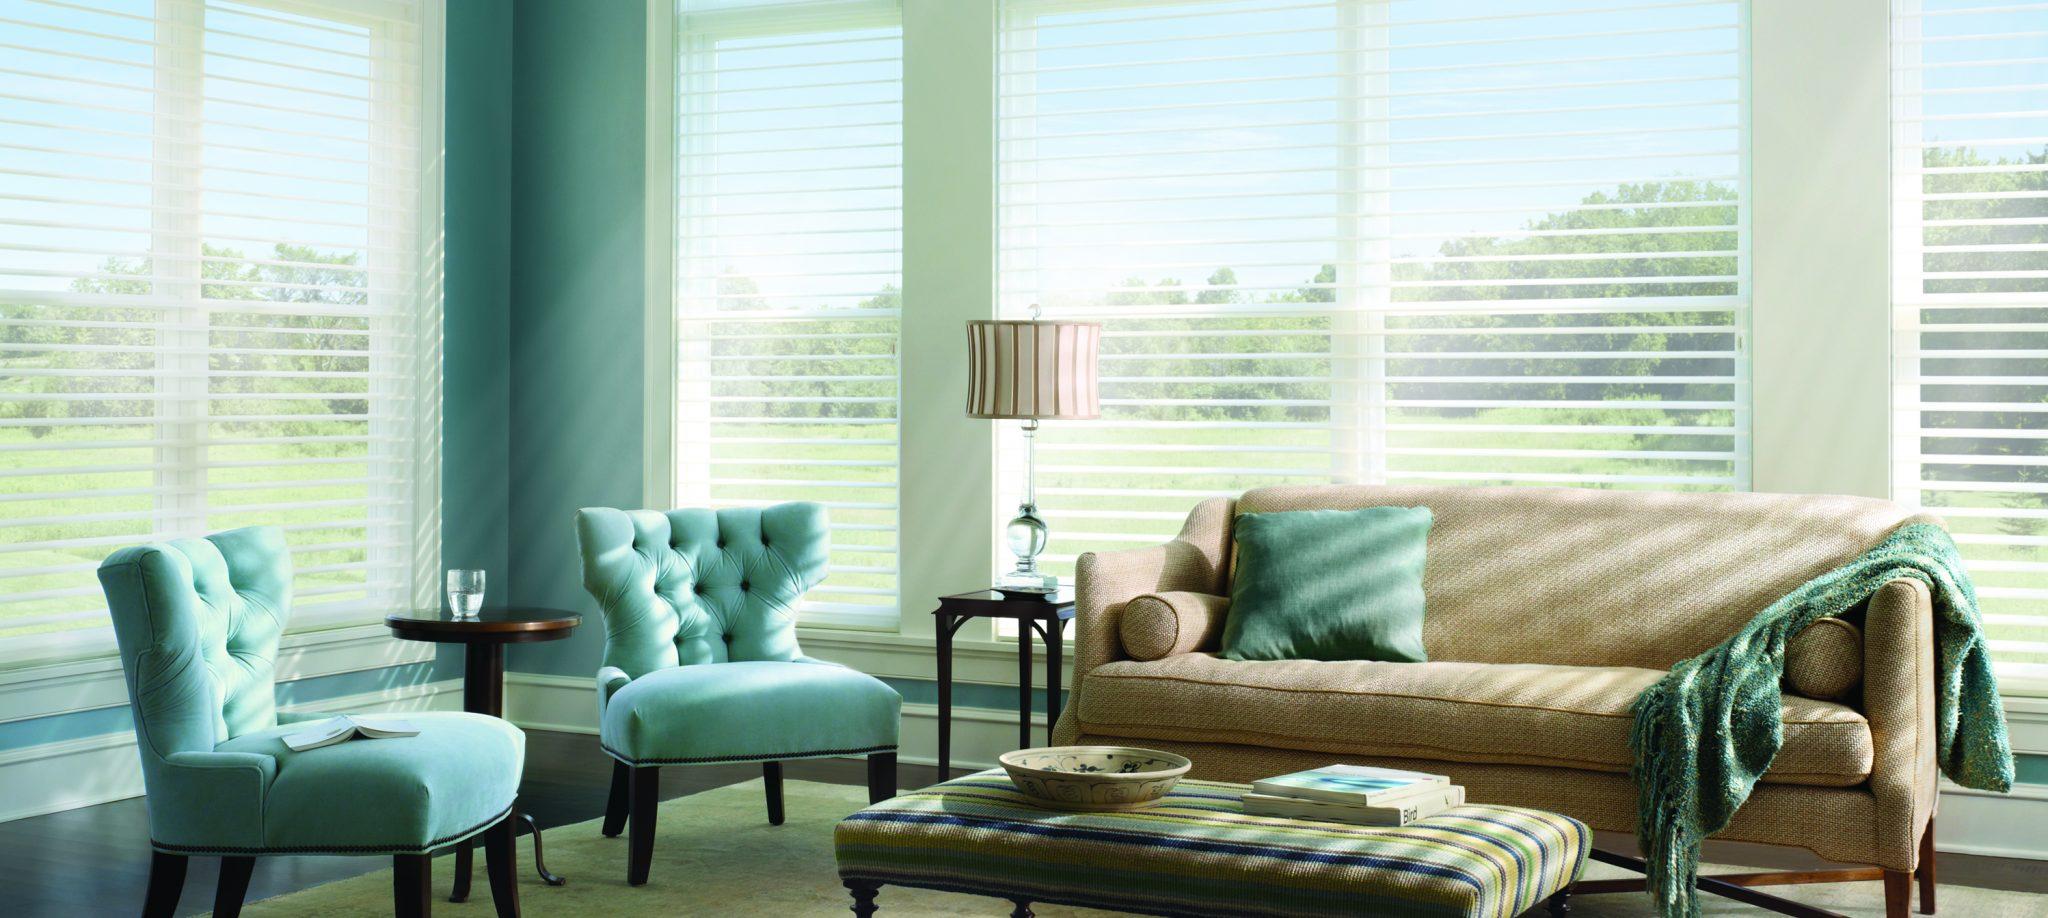 Hunter Douglas Silhouette Shadings | The Well Dressed Window Kelowna